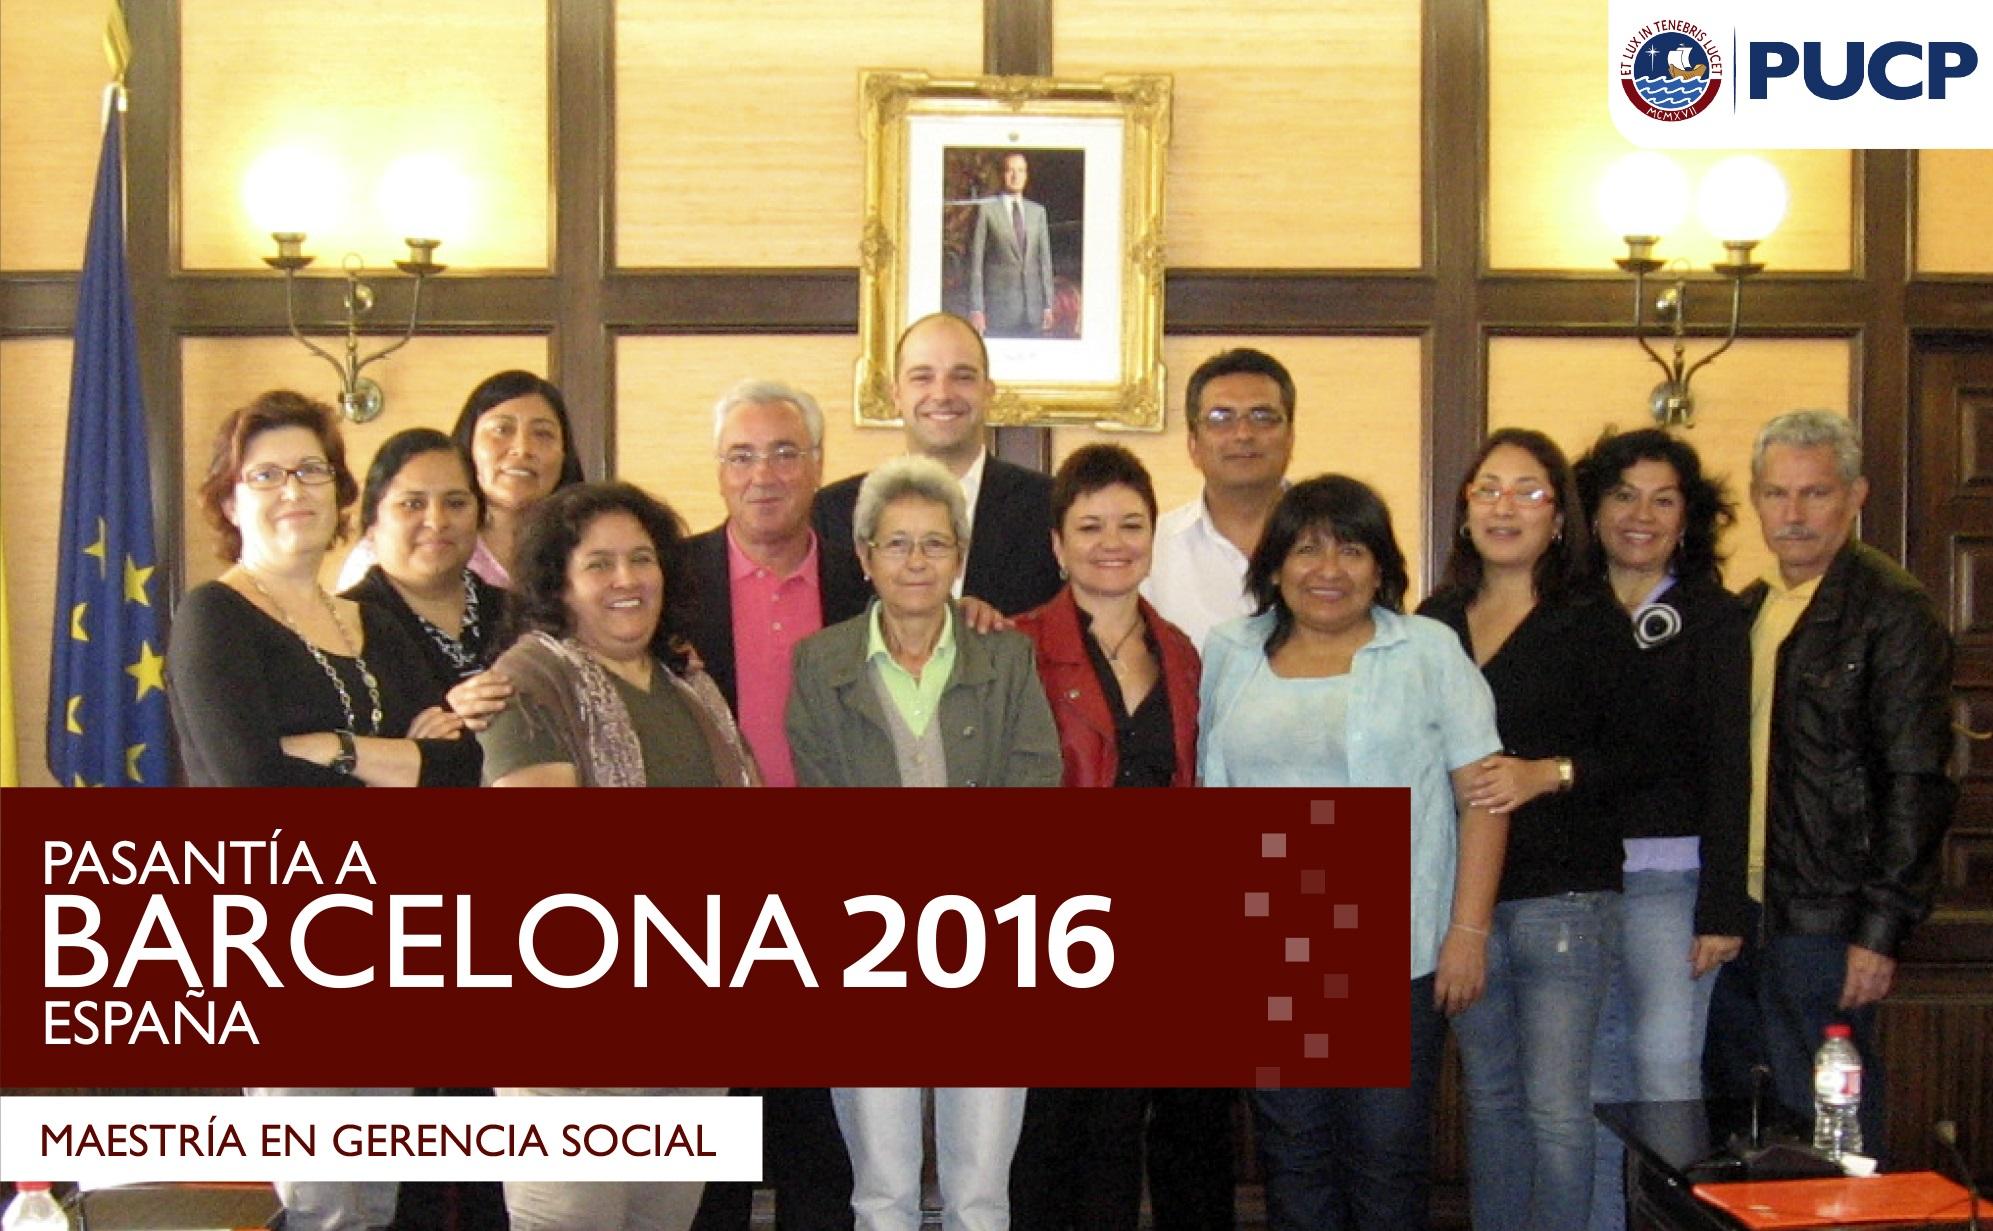 barcelona 2016